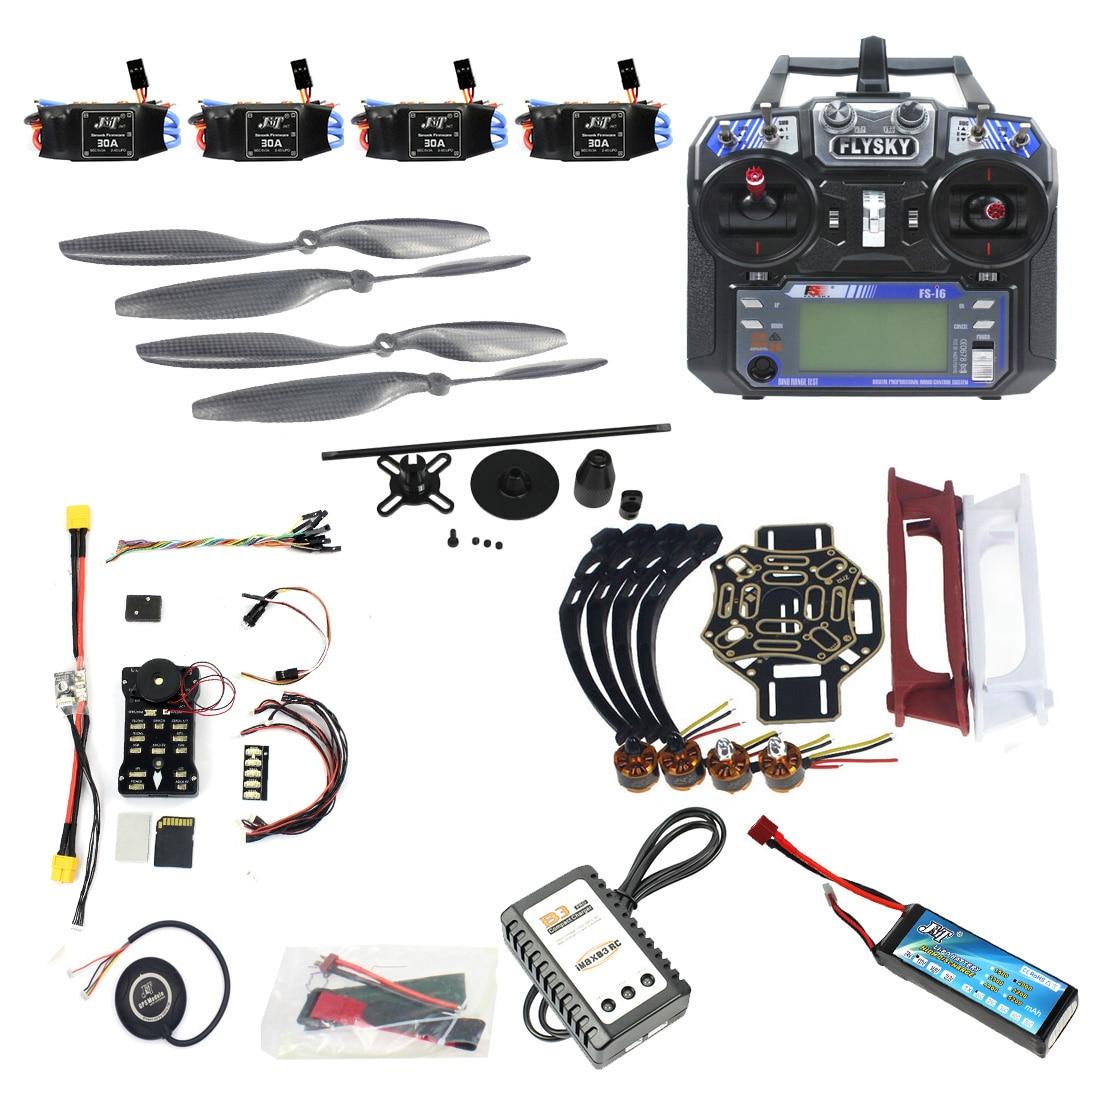 DIY FPV Drone Quadcopter 4 as Vliegtuigen Kit 450 Frame PXI PX4 Flight Control 920KV Motor GPS FS i6 Zender f02192 AC-in RC Vliegtuigen van Speelgoed & Hobbies op  Groep 1